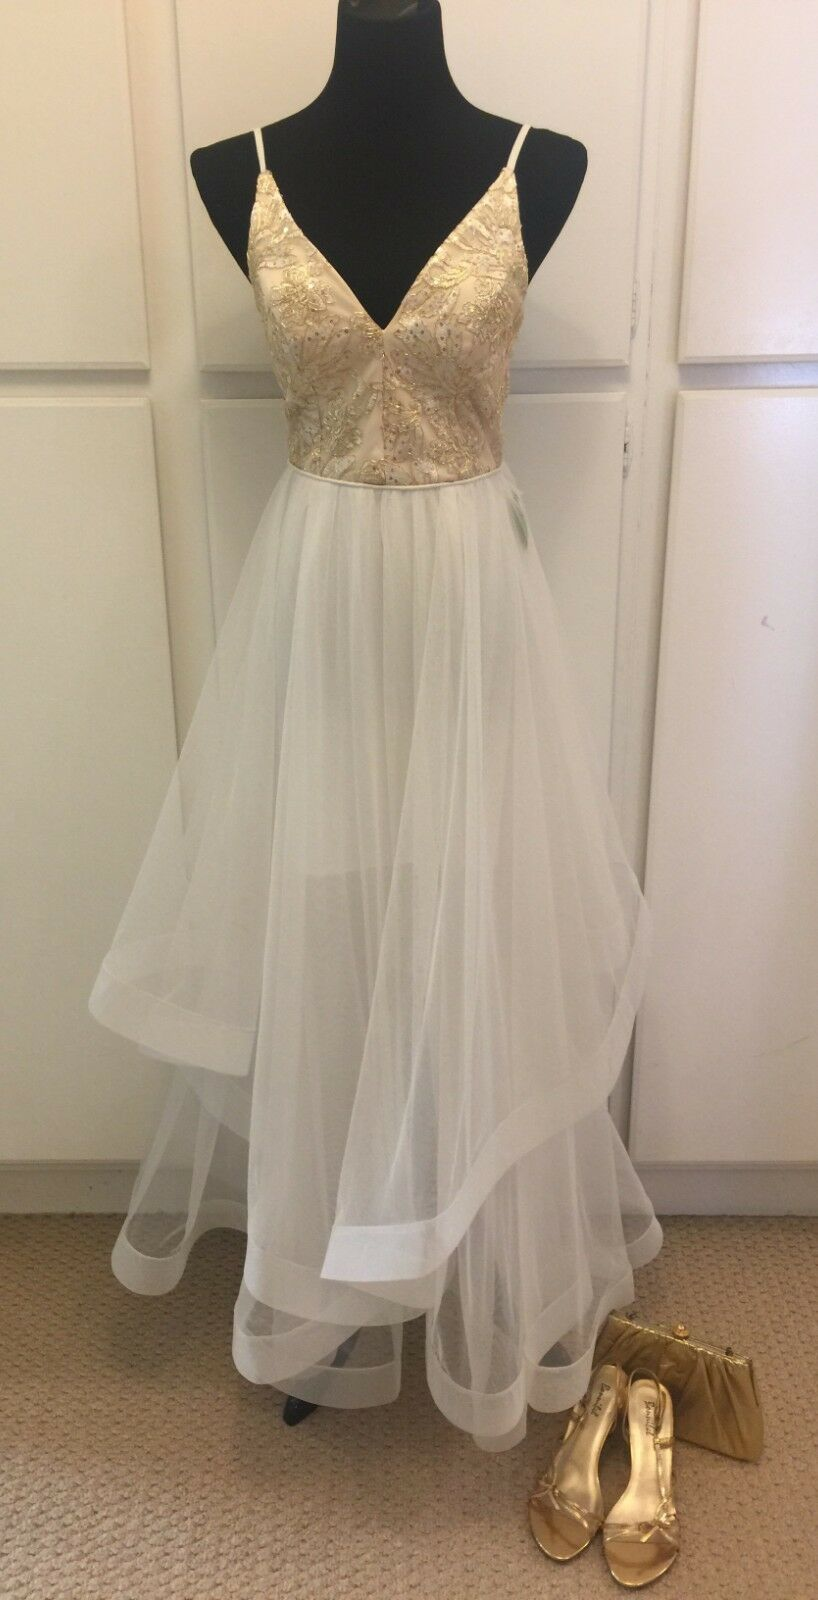 damen WINDSOR Homecoming Prom Formal Weiß & Gold Tulle Gown Größe 7